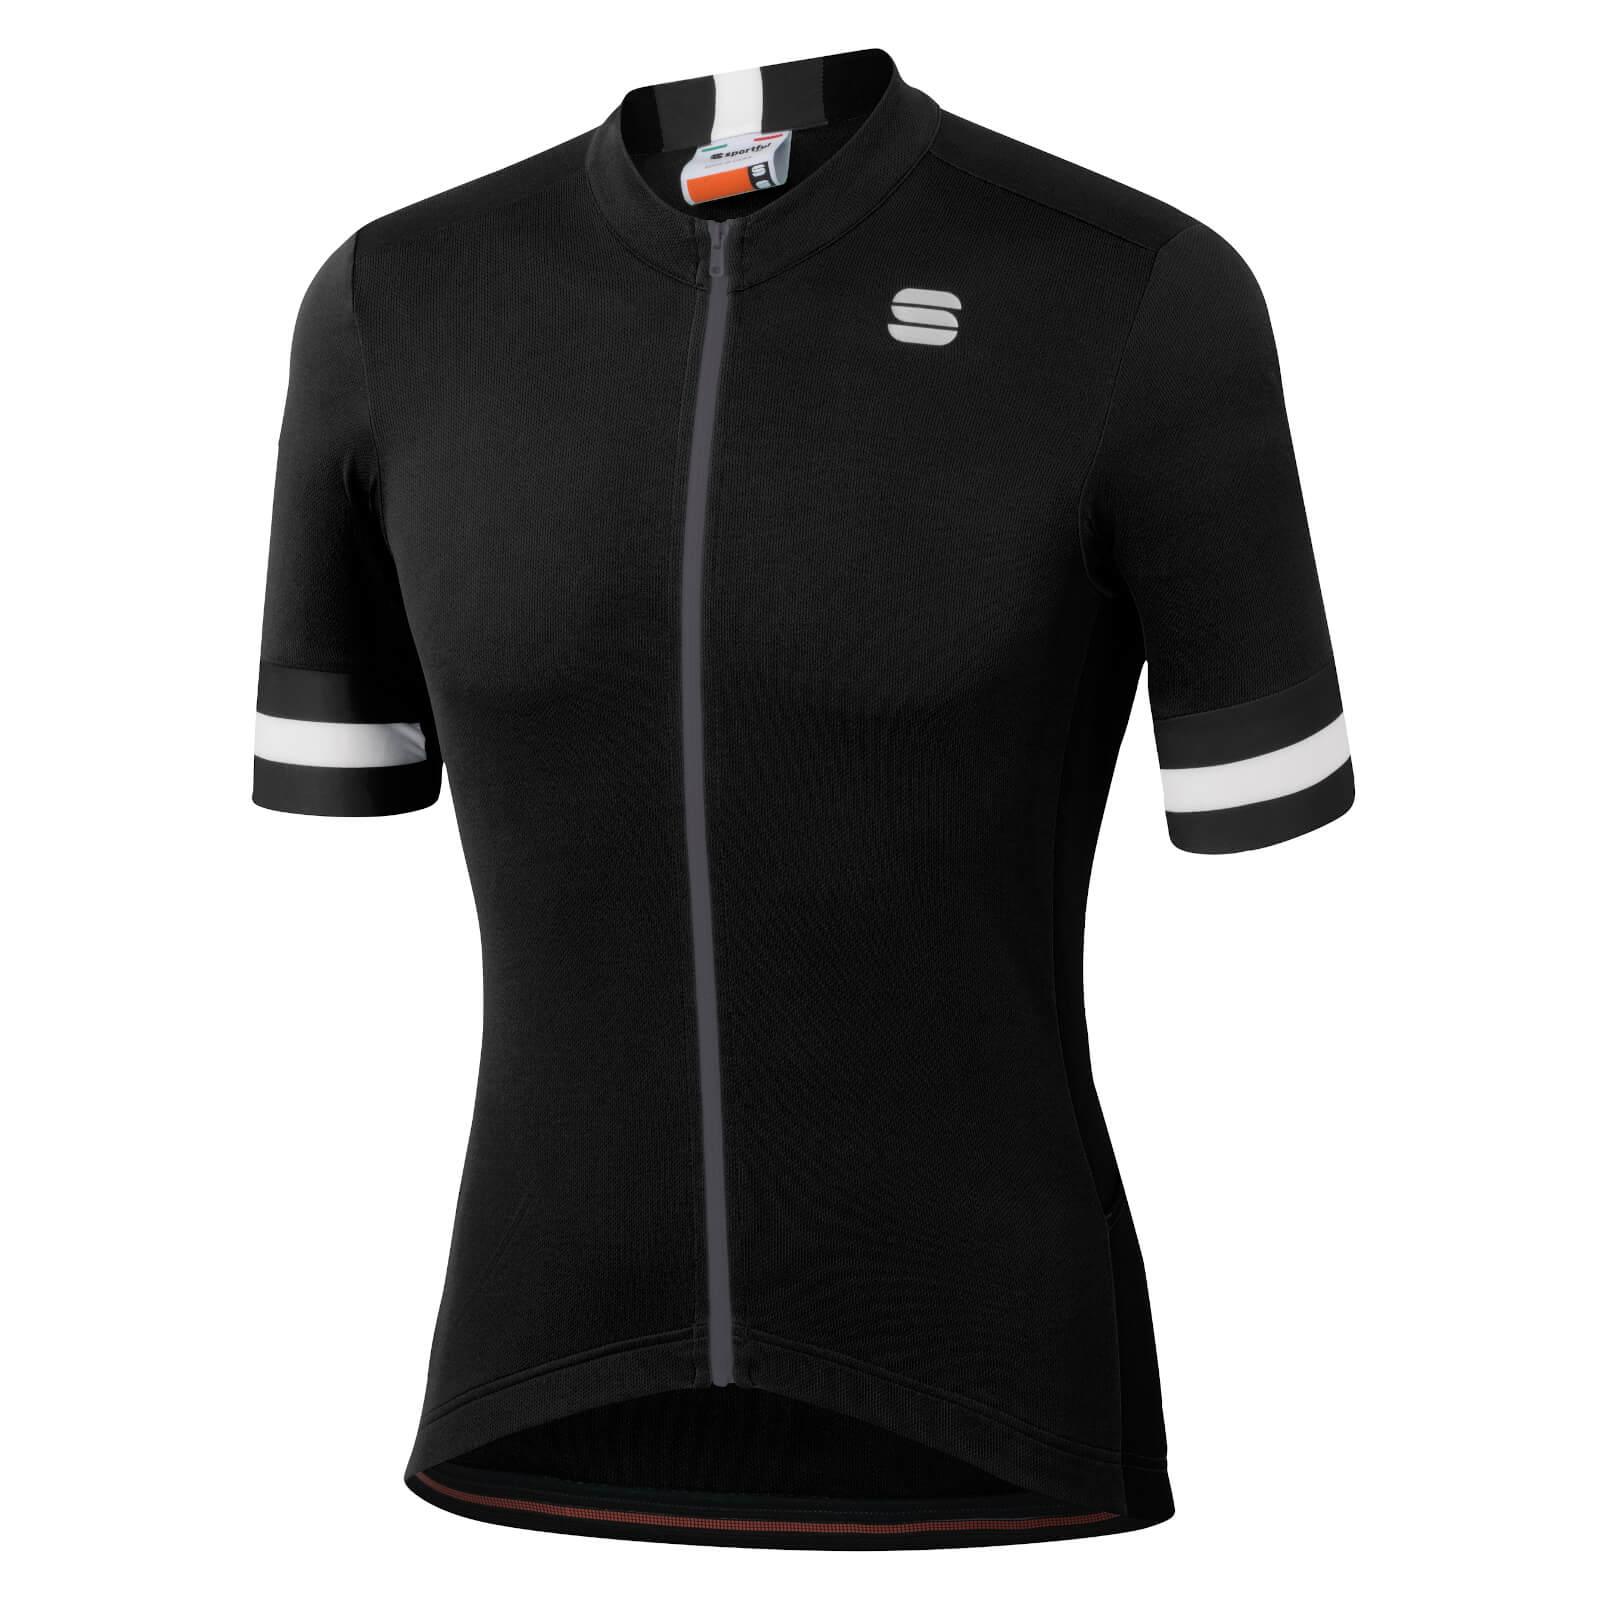 Sportful Kite Jersey - L - Black